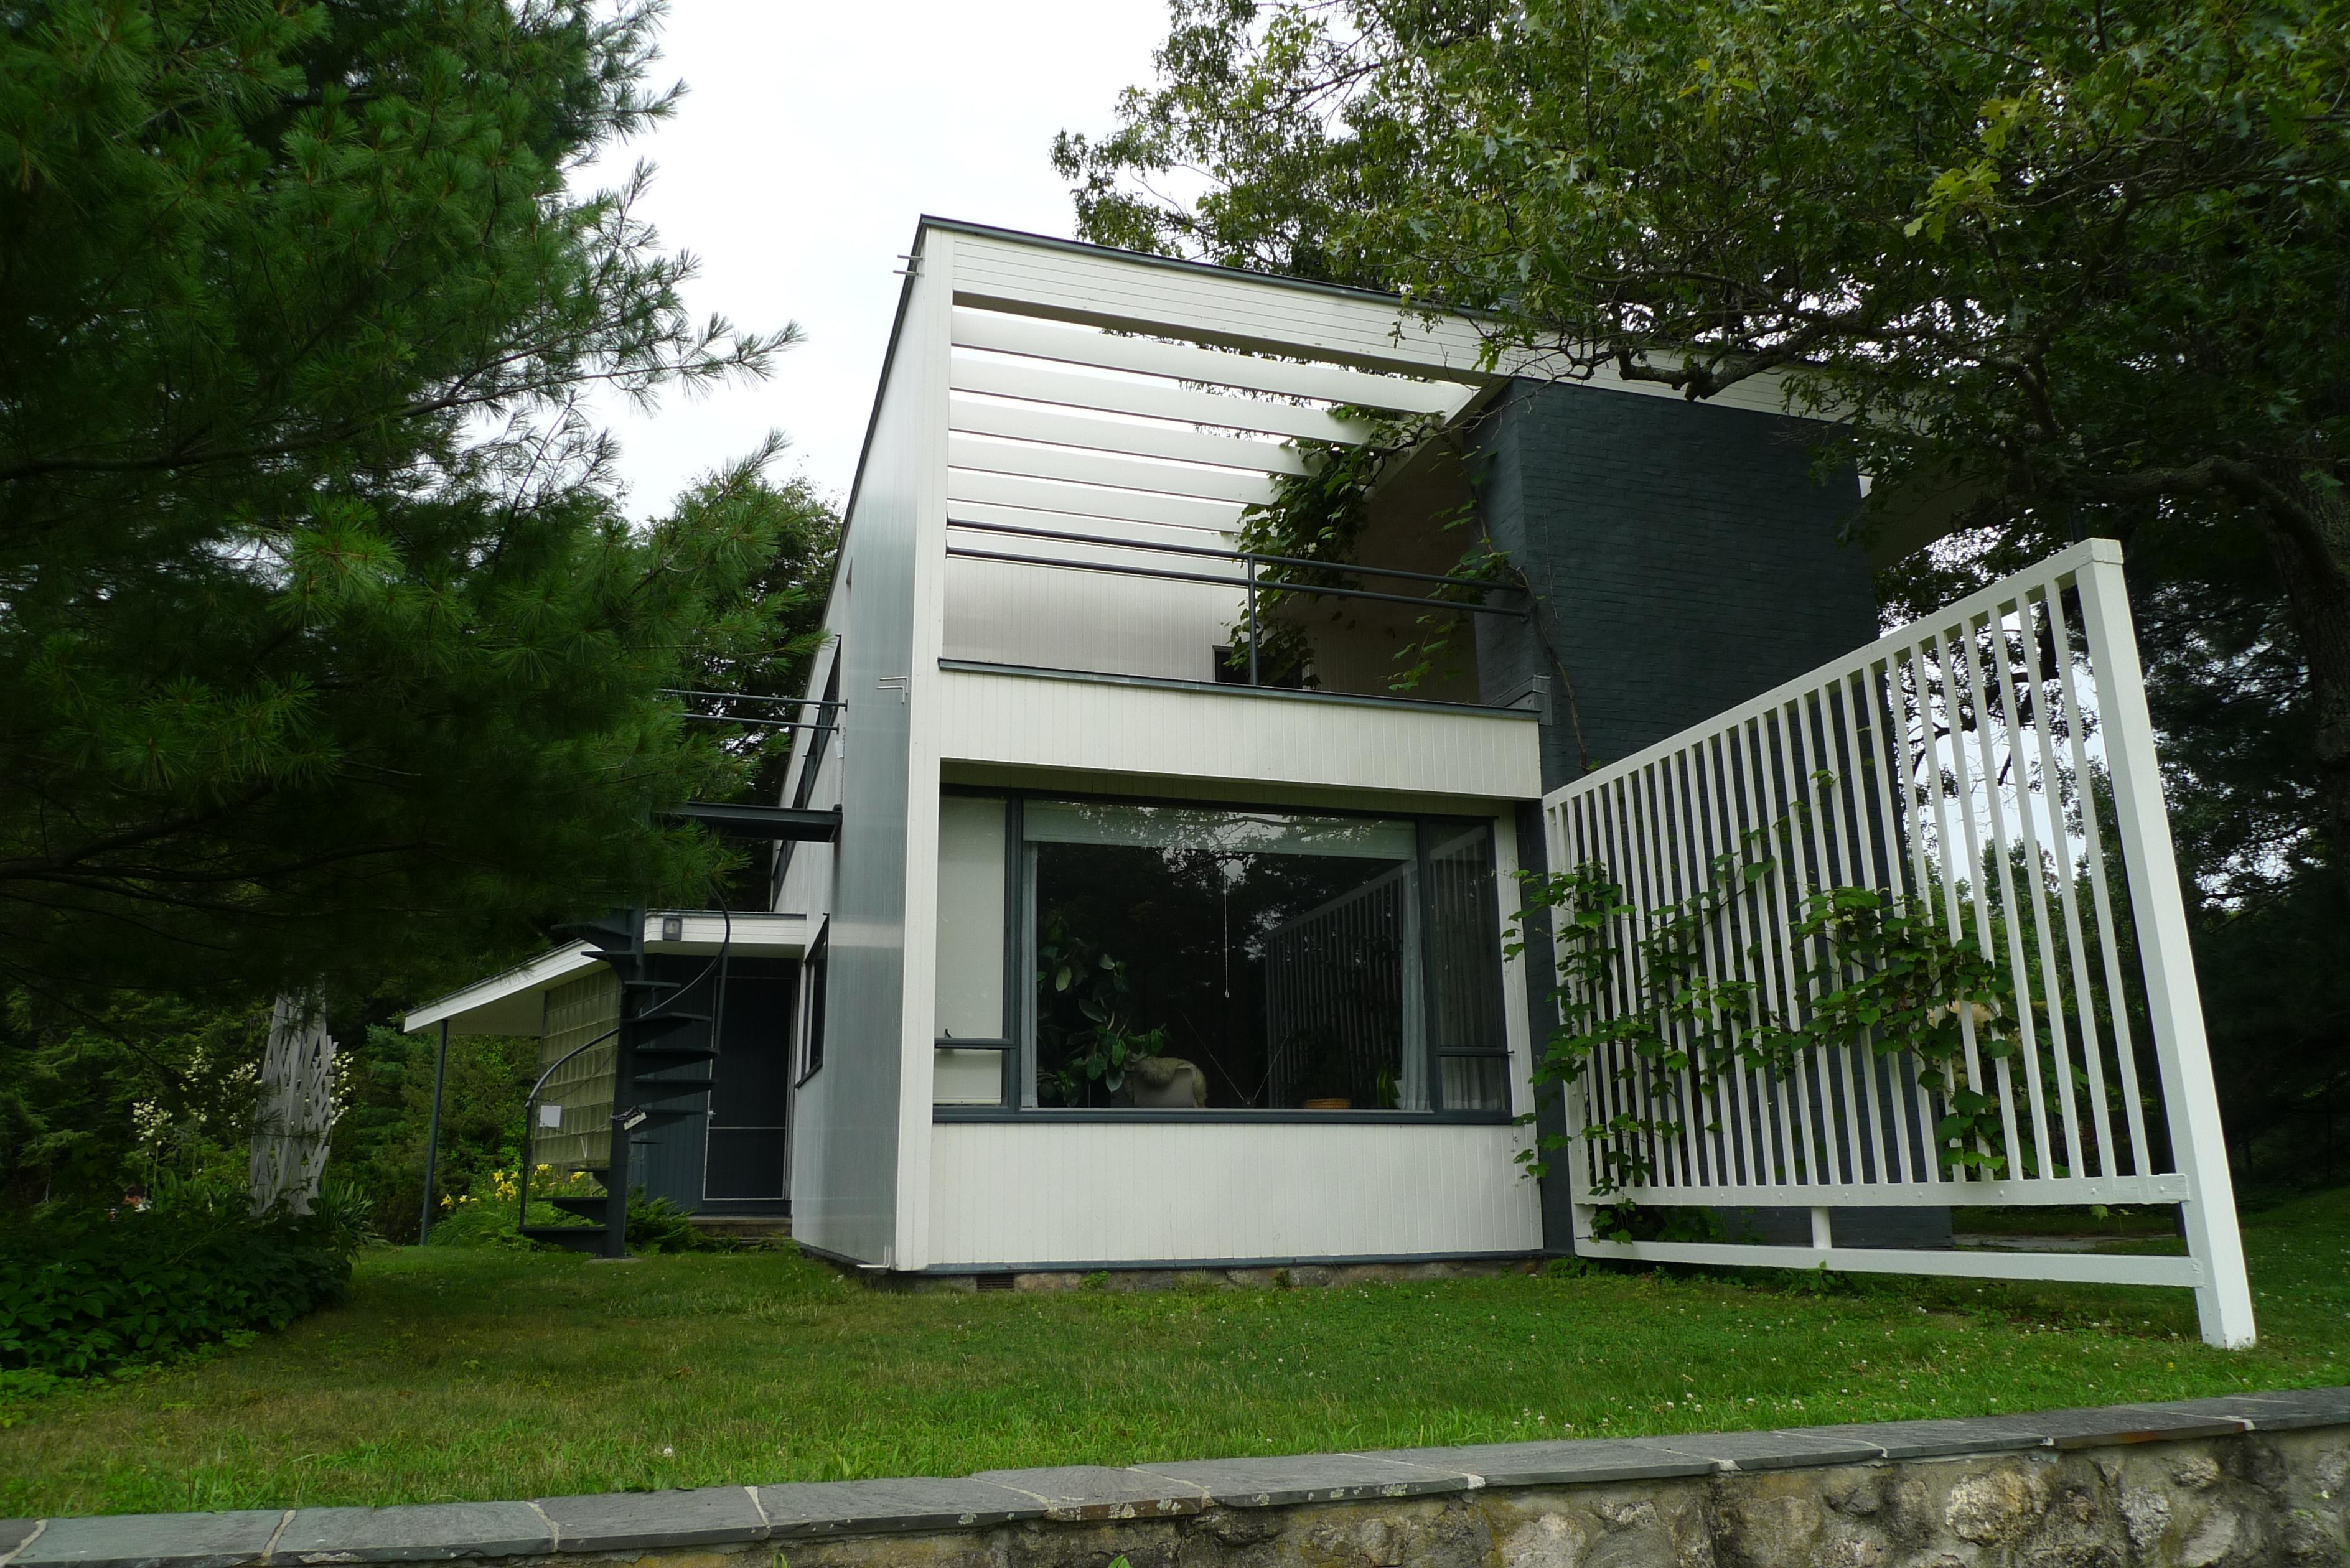 Gropius House homes walter gropius house tammy tour guide